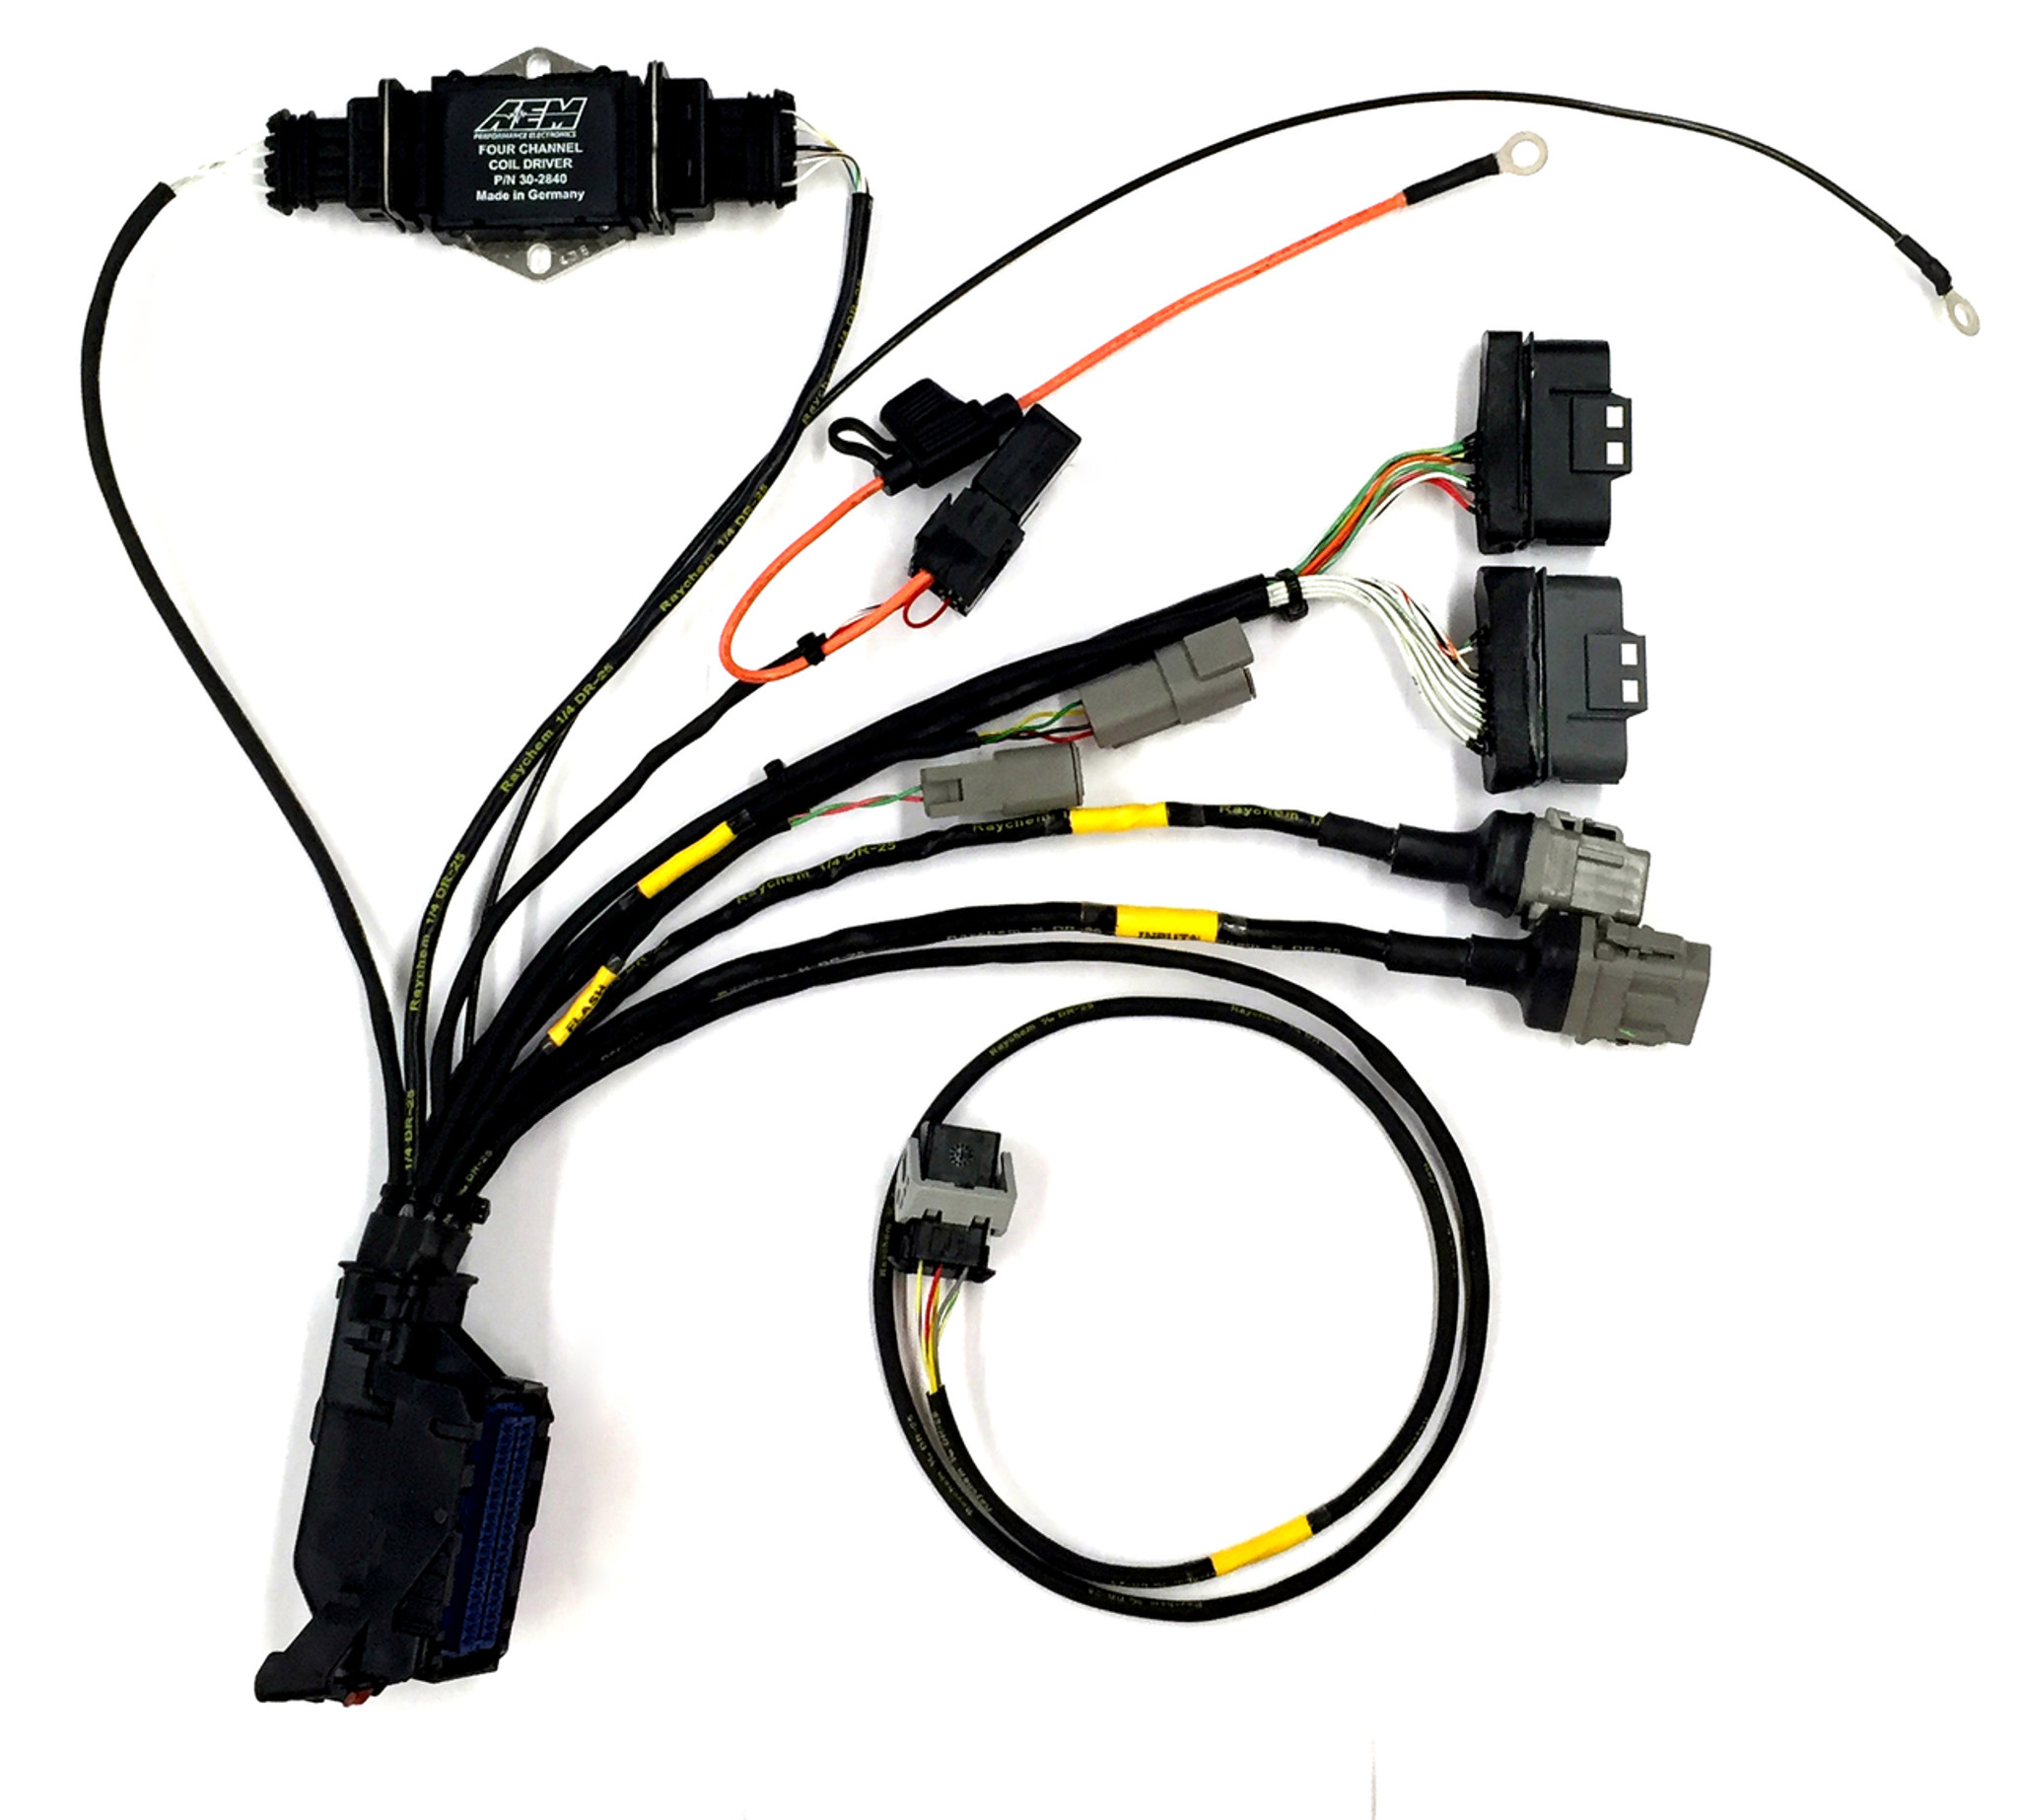 infinity ecu plug and play wiring harness shop htp aem fic wiring harness aem wiring harness [ 2048 x 1846 Pixel ]